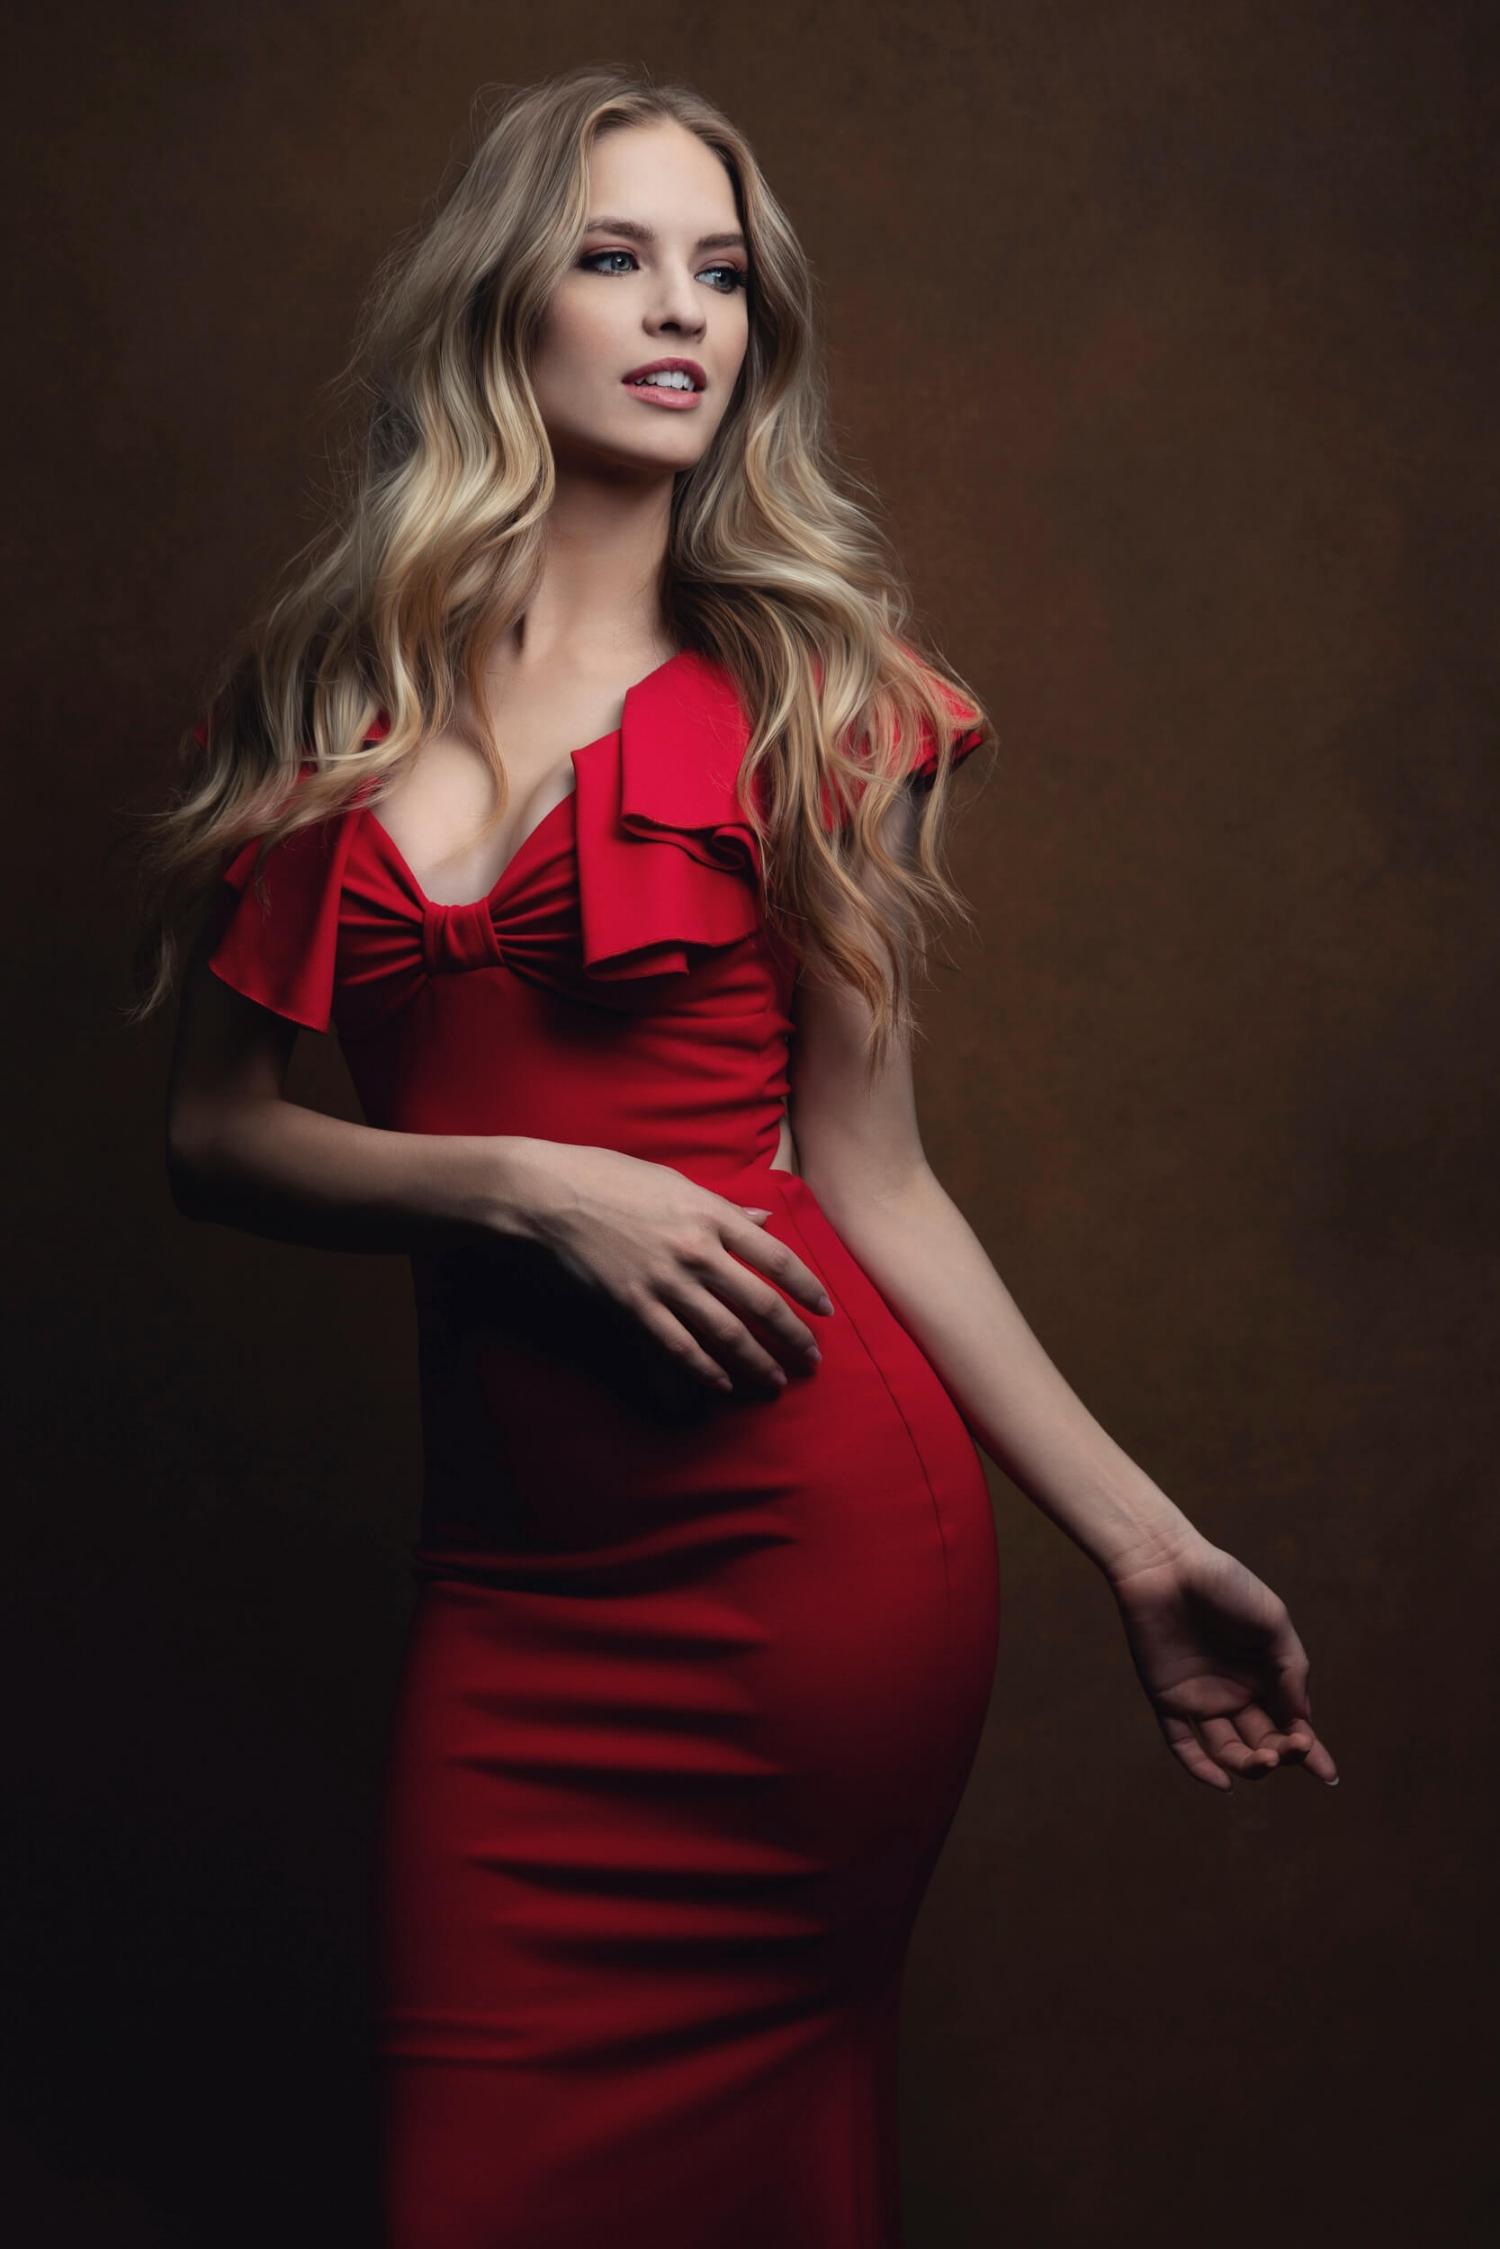 Beautiful-blond-girl-Red-dress-portraiture-Starnberg